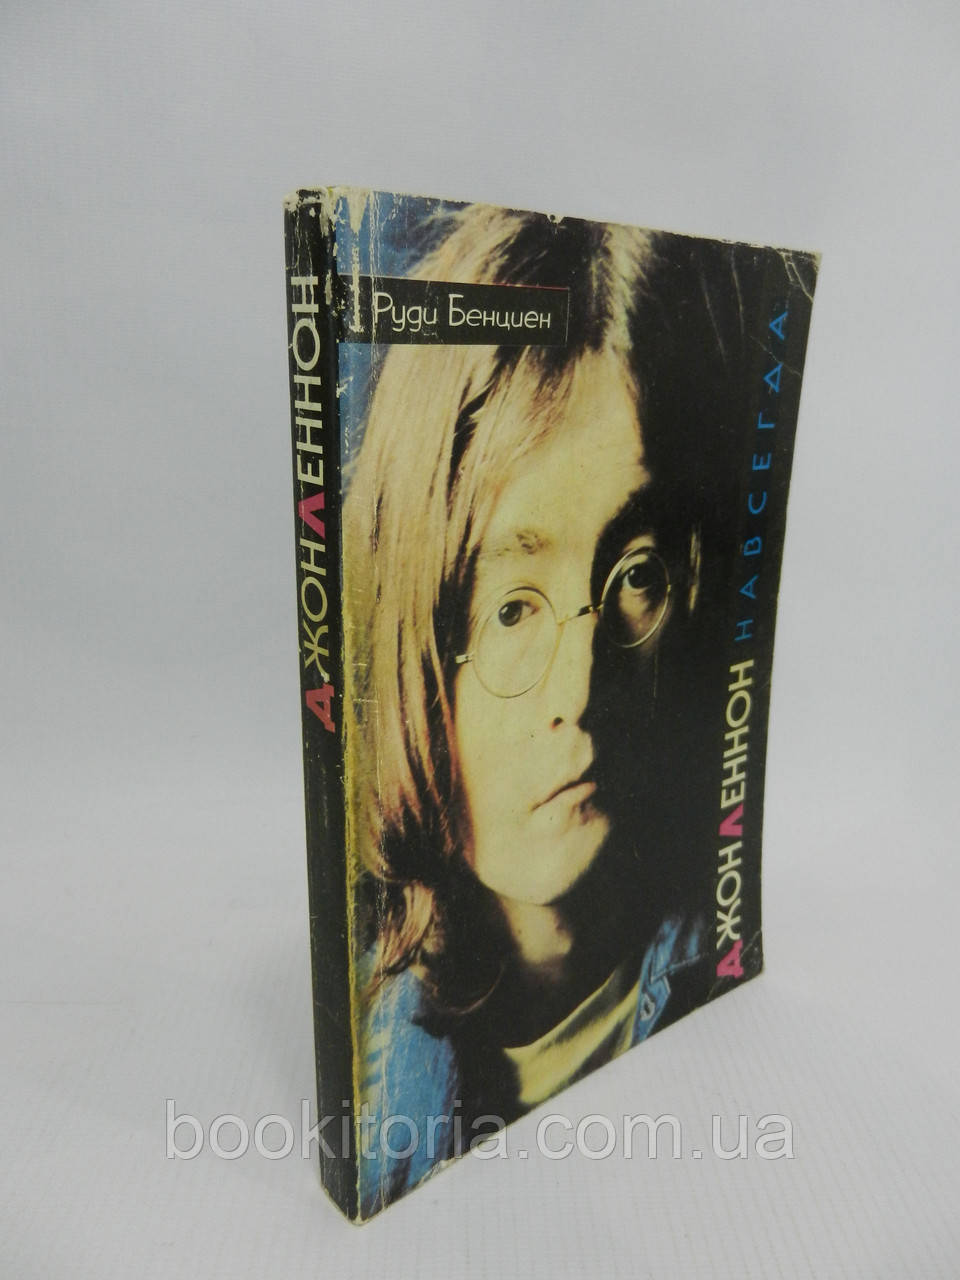 Бенциен Р. Джон Леннон навсегда (б/у).